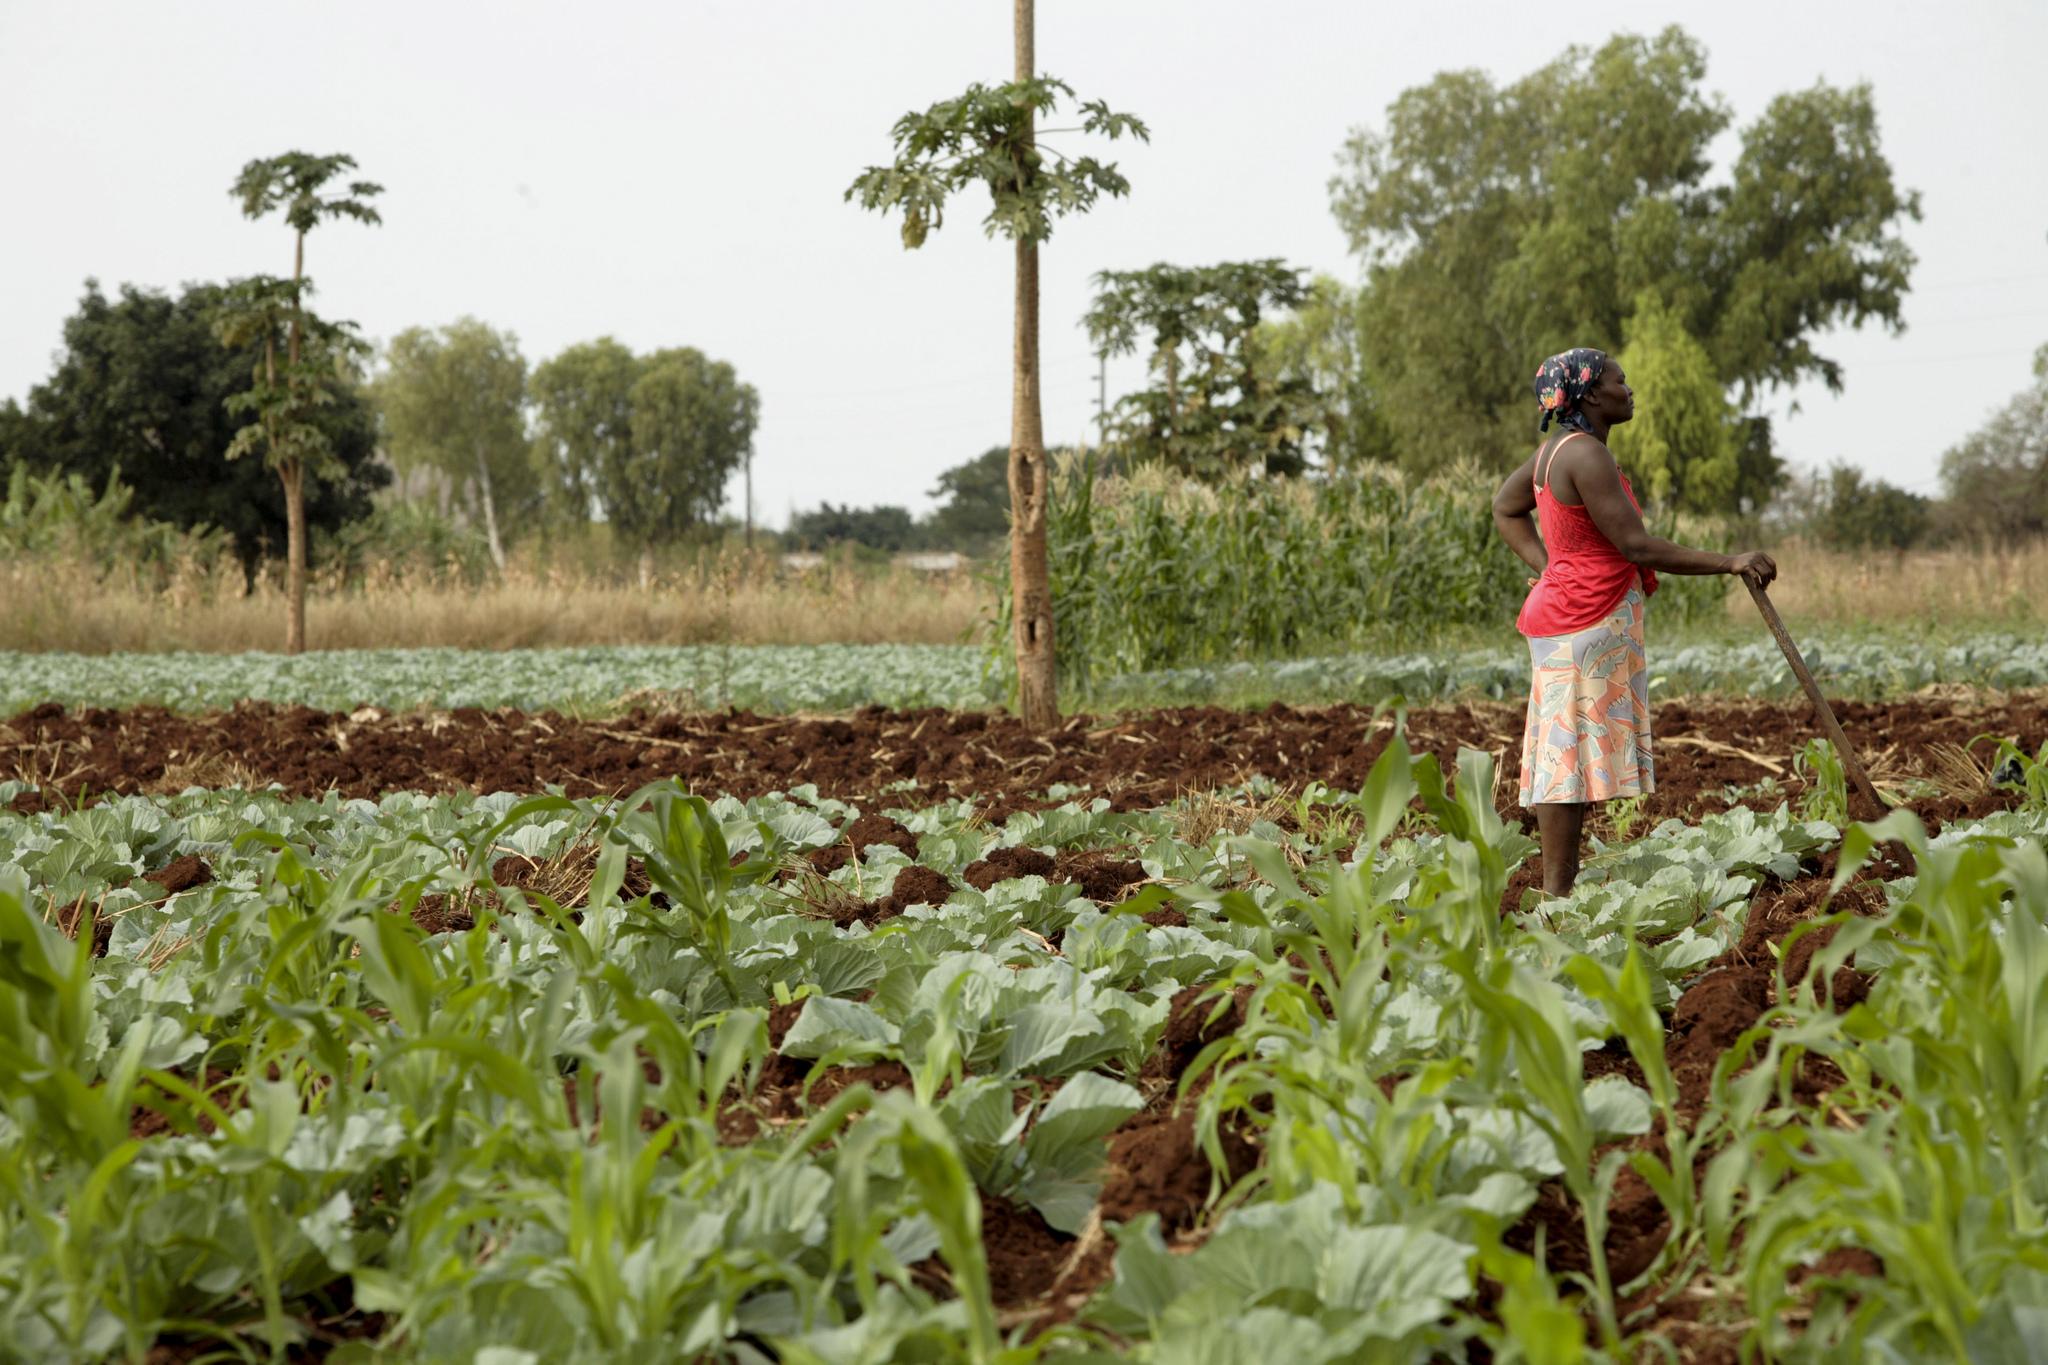 Funding the Sustainable Development Goals